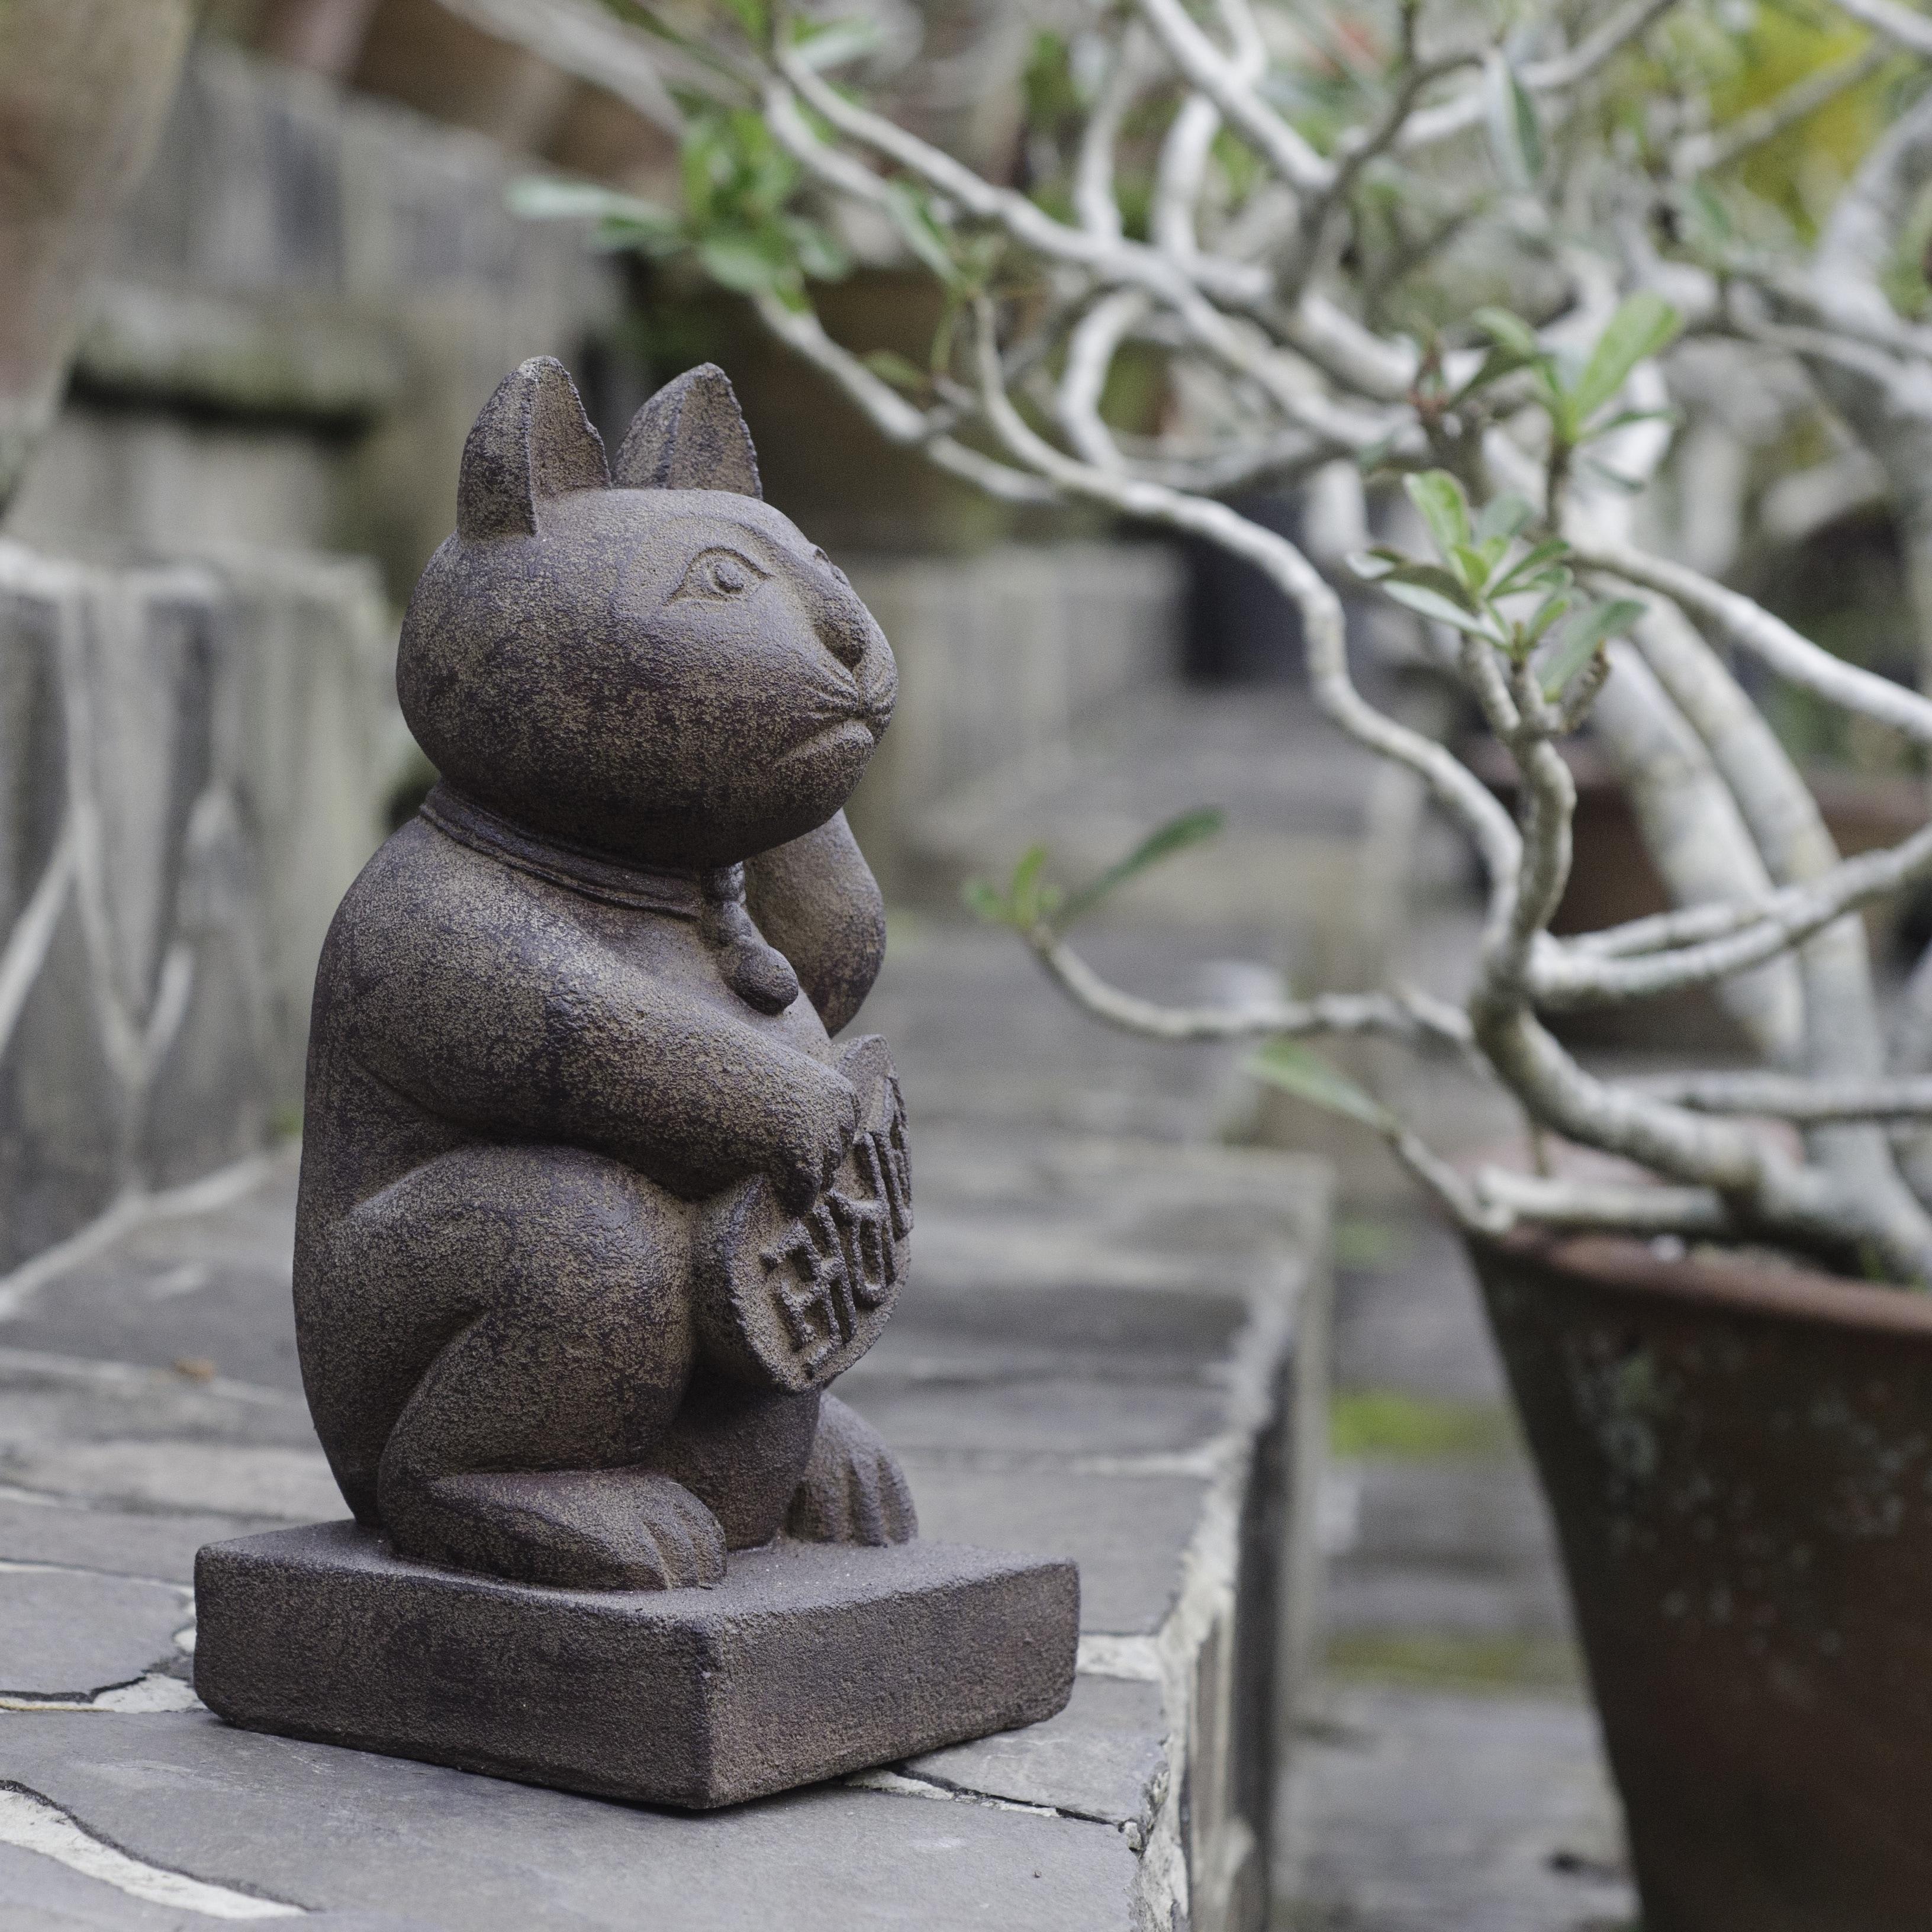 home figurine office or for best by indoor cat garden itm outdoor d mark cor statue gnome margot decor art mischievous